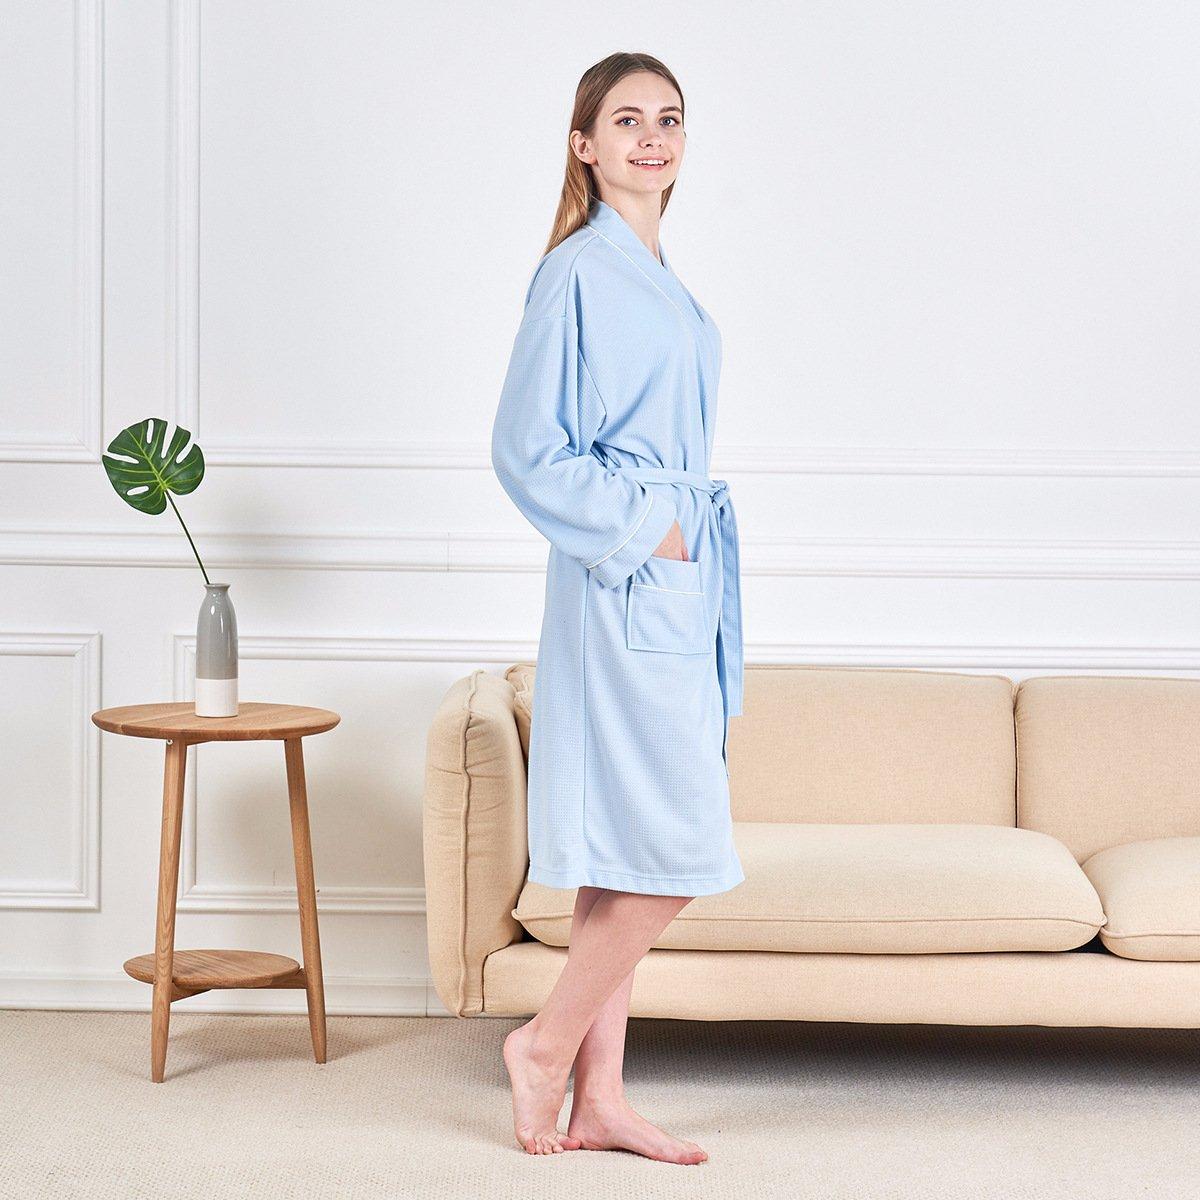 bda39d480c Amazon.com  Junebloom Women s Kimono Robes Cotton Soft Lightweight Waffle  Bathrobe Short Sleepwear  Home   Kitchen